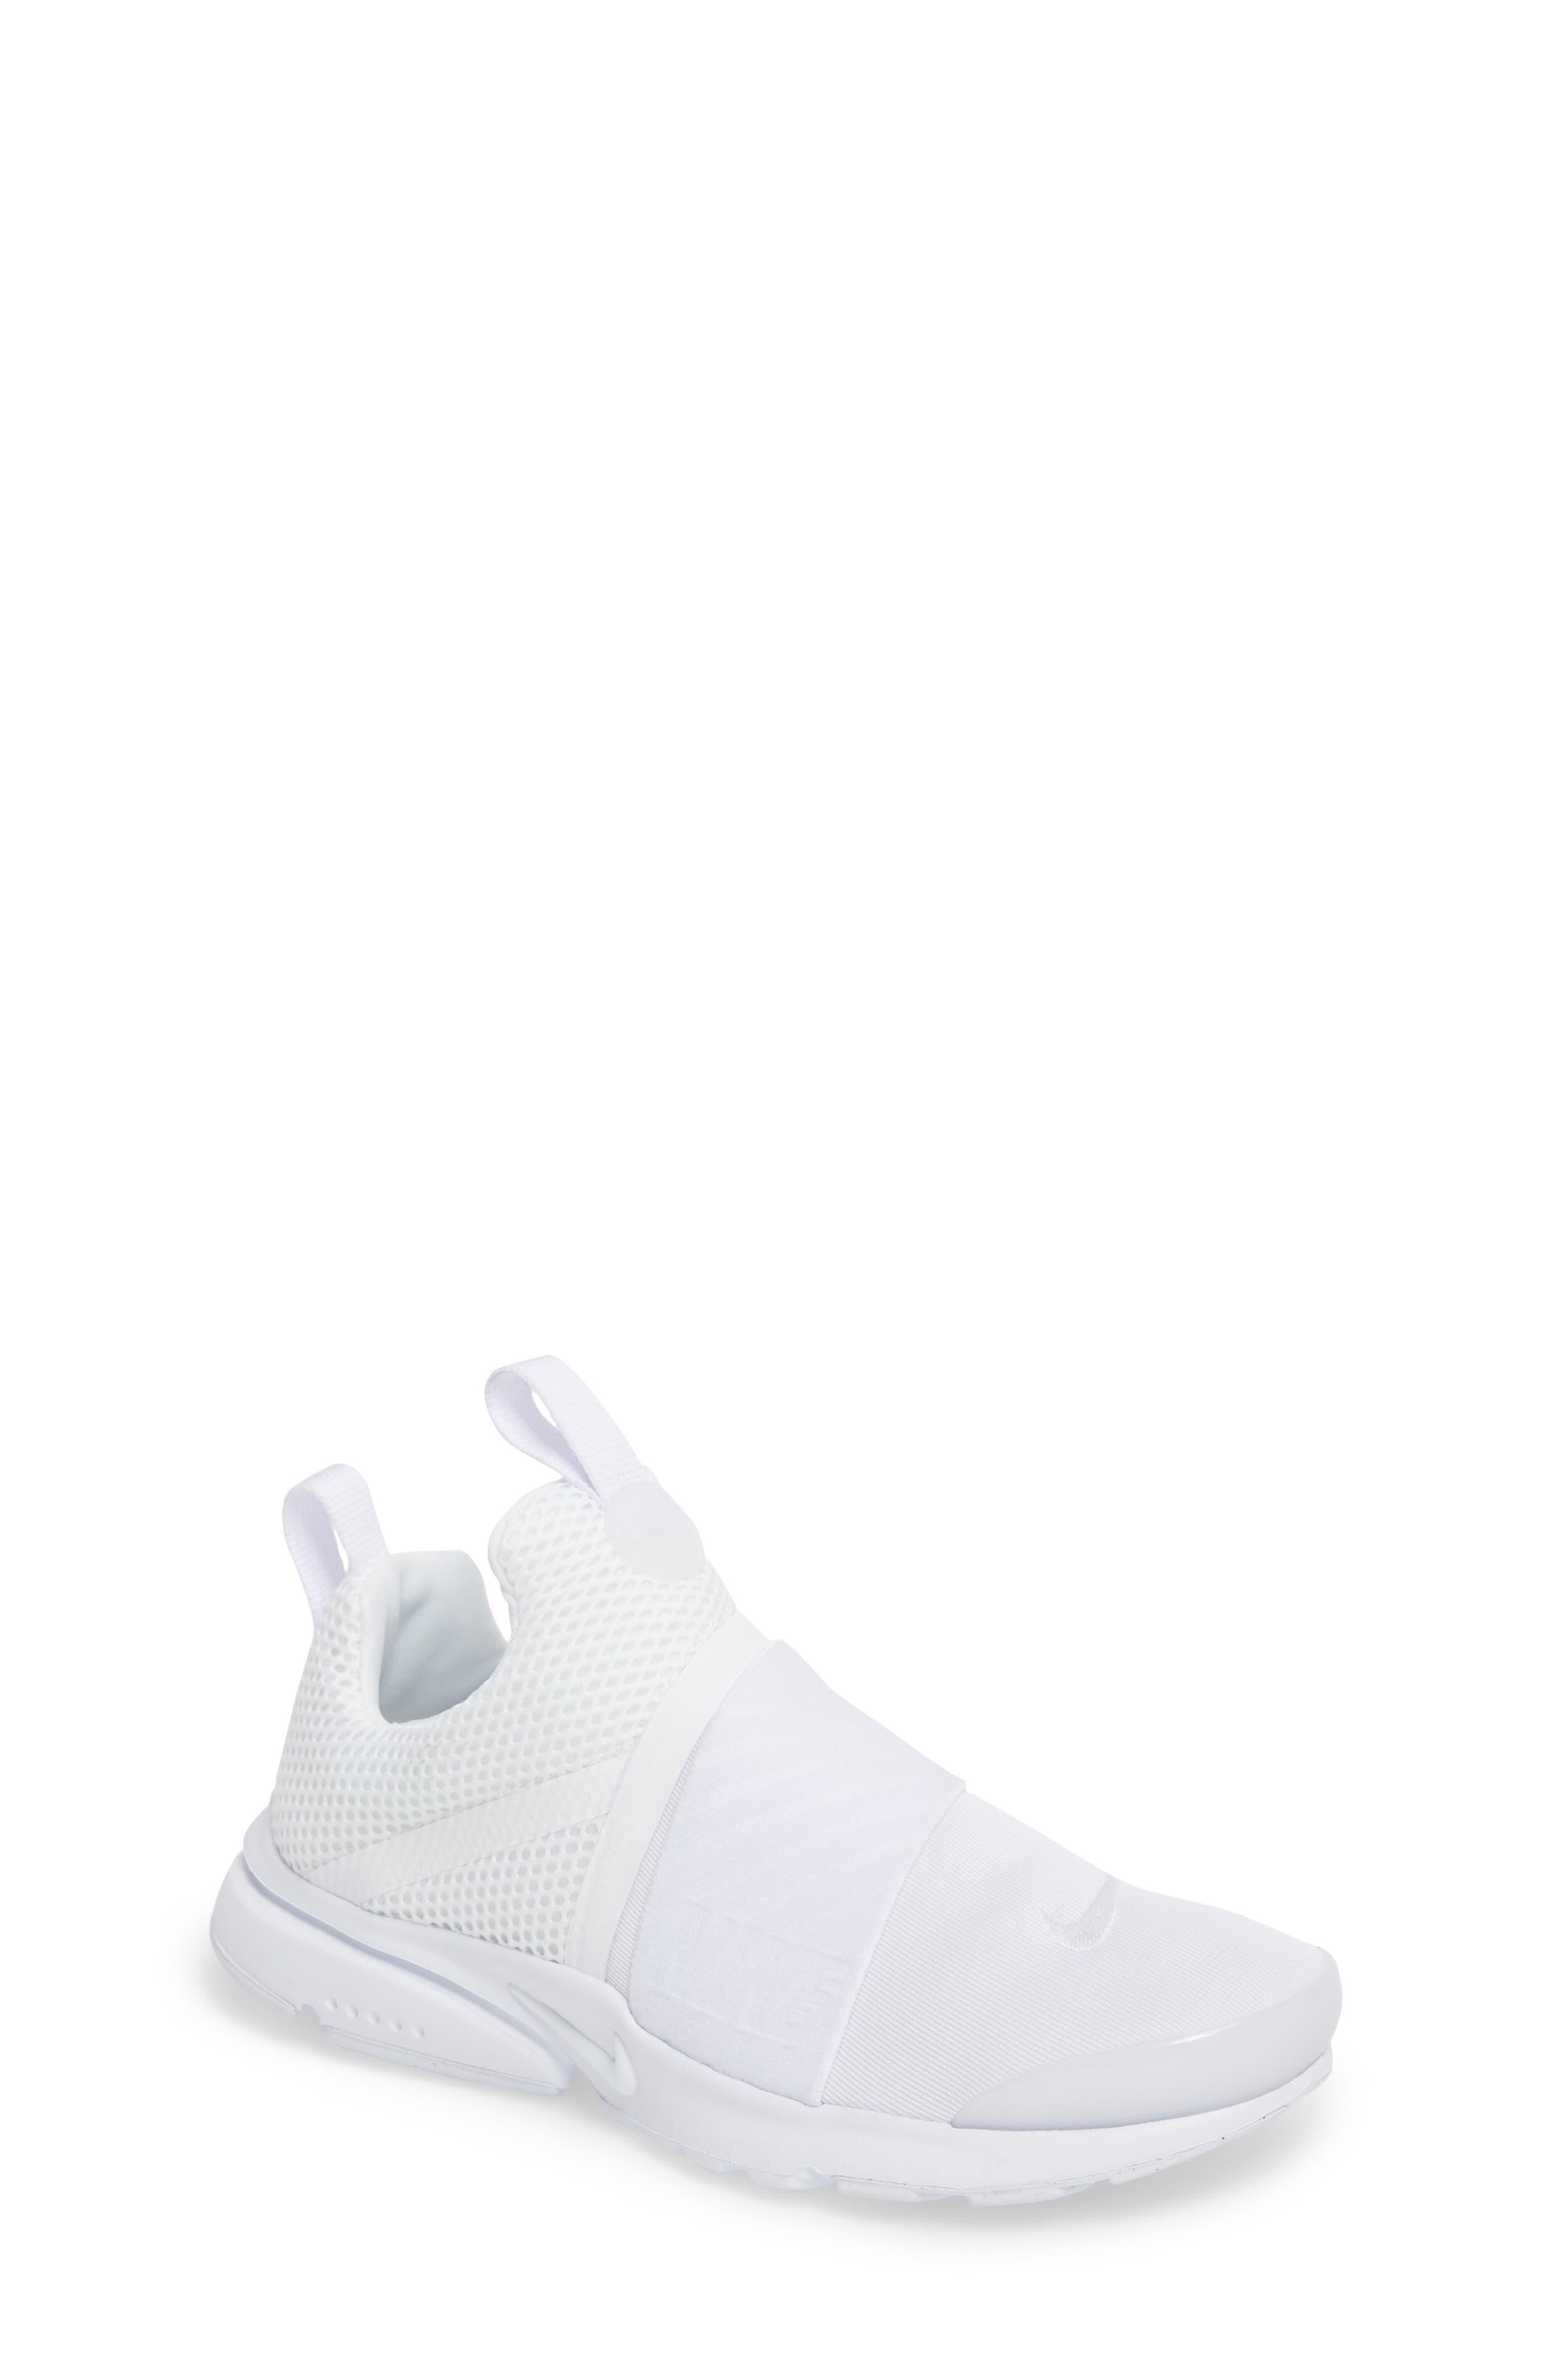 Presto Extreme Sneaker,                         Main,                         color, White/ White/ White